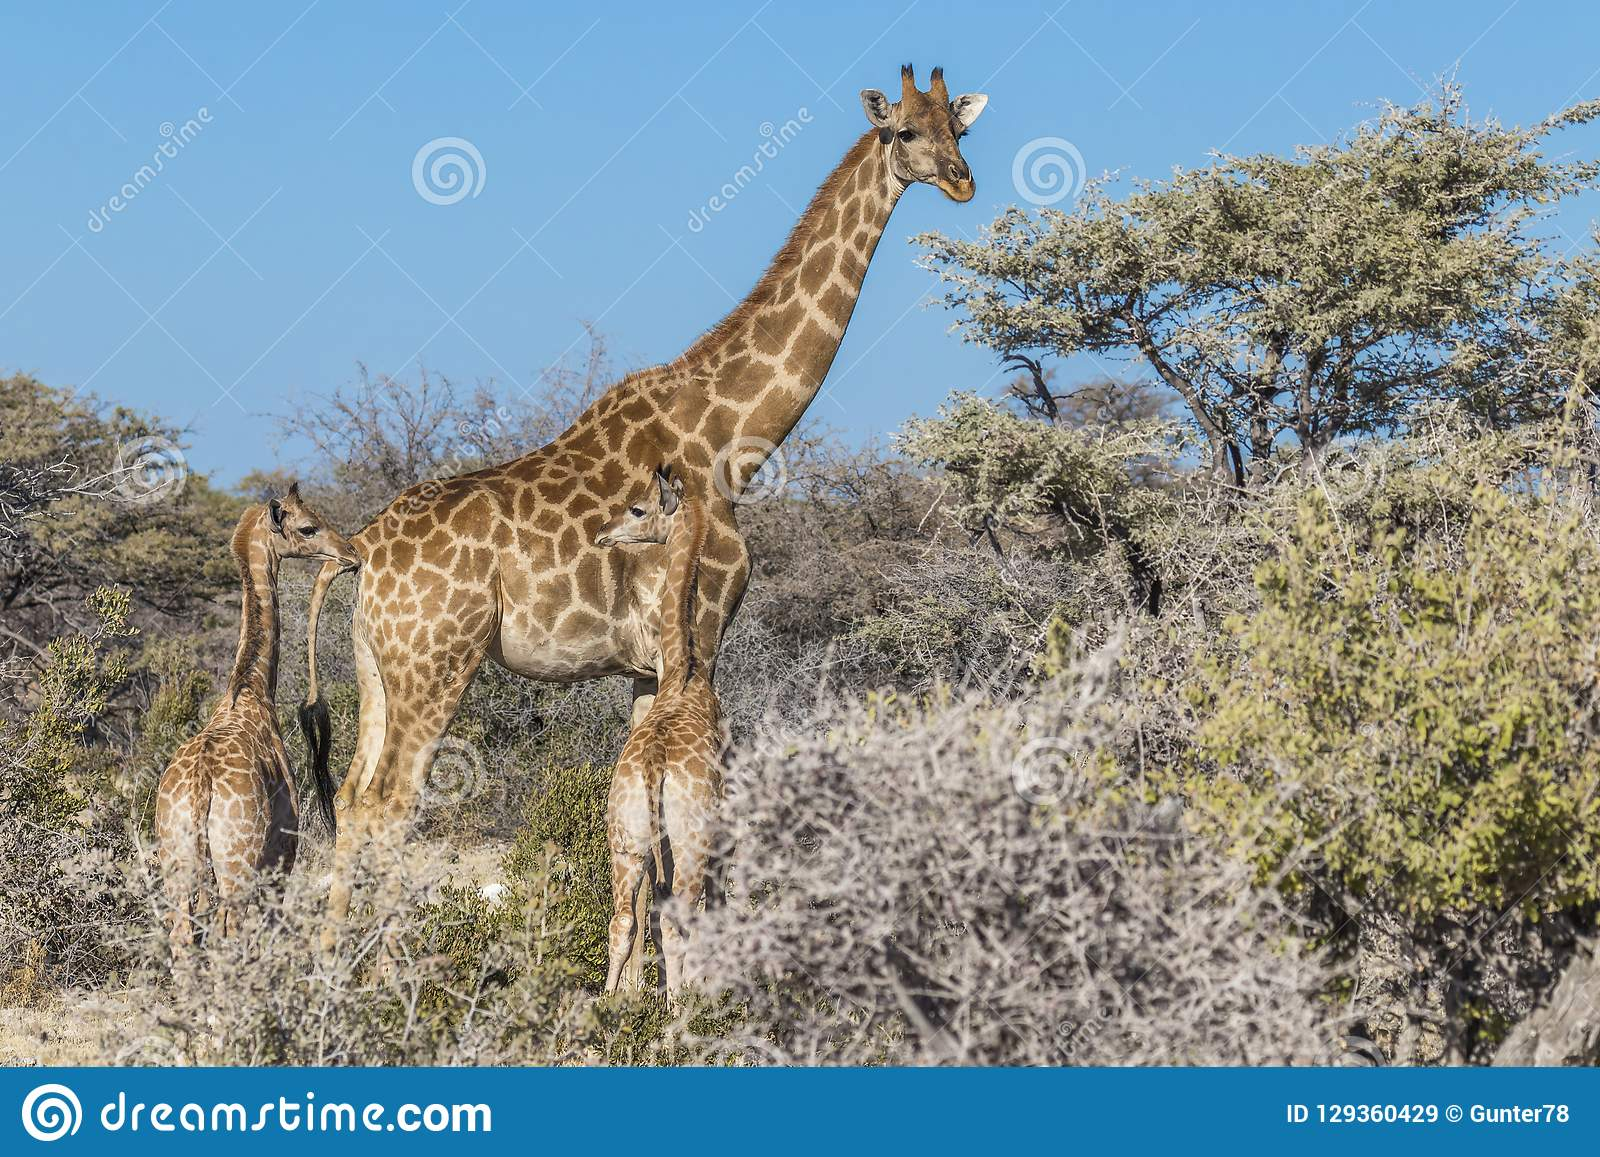 A mother giraffe Giraffa Camelopardalis with two babies, Etosha National Park, Namibia.